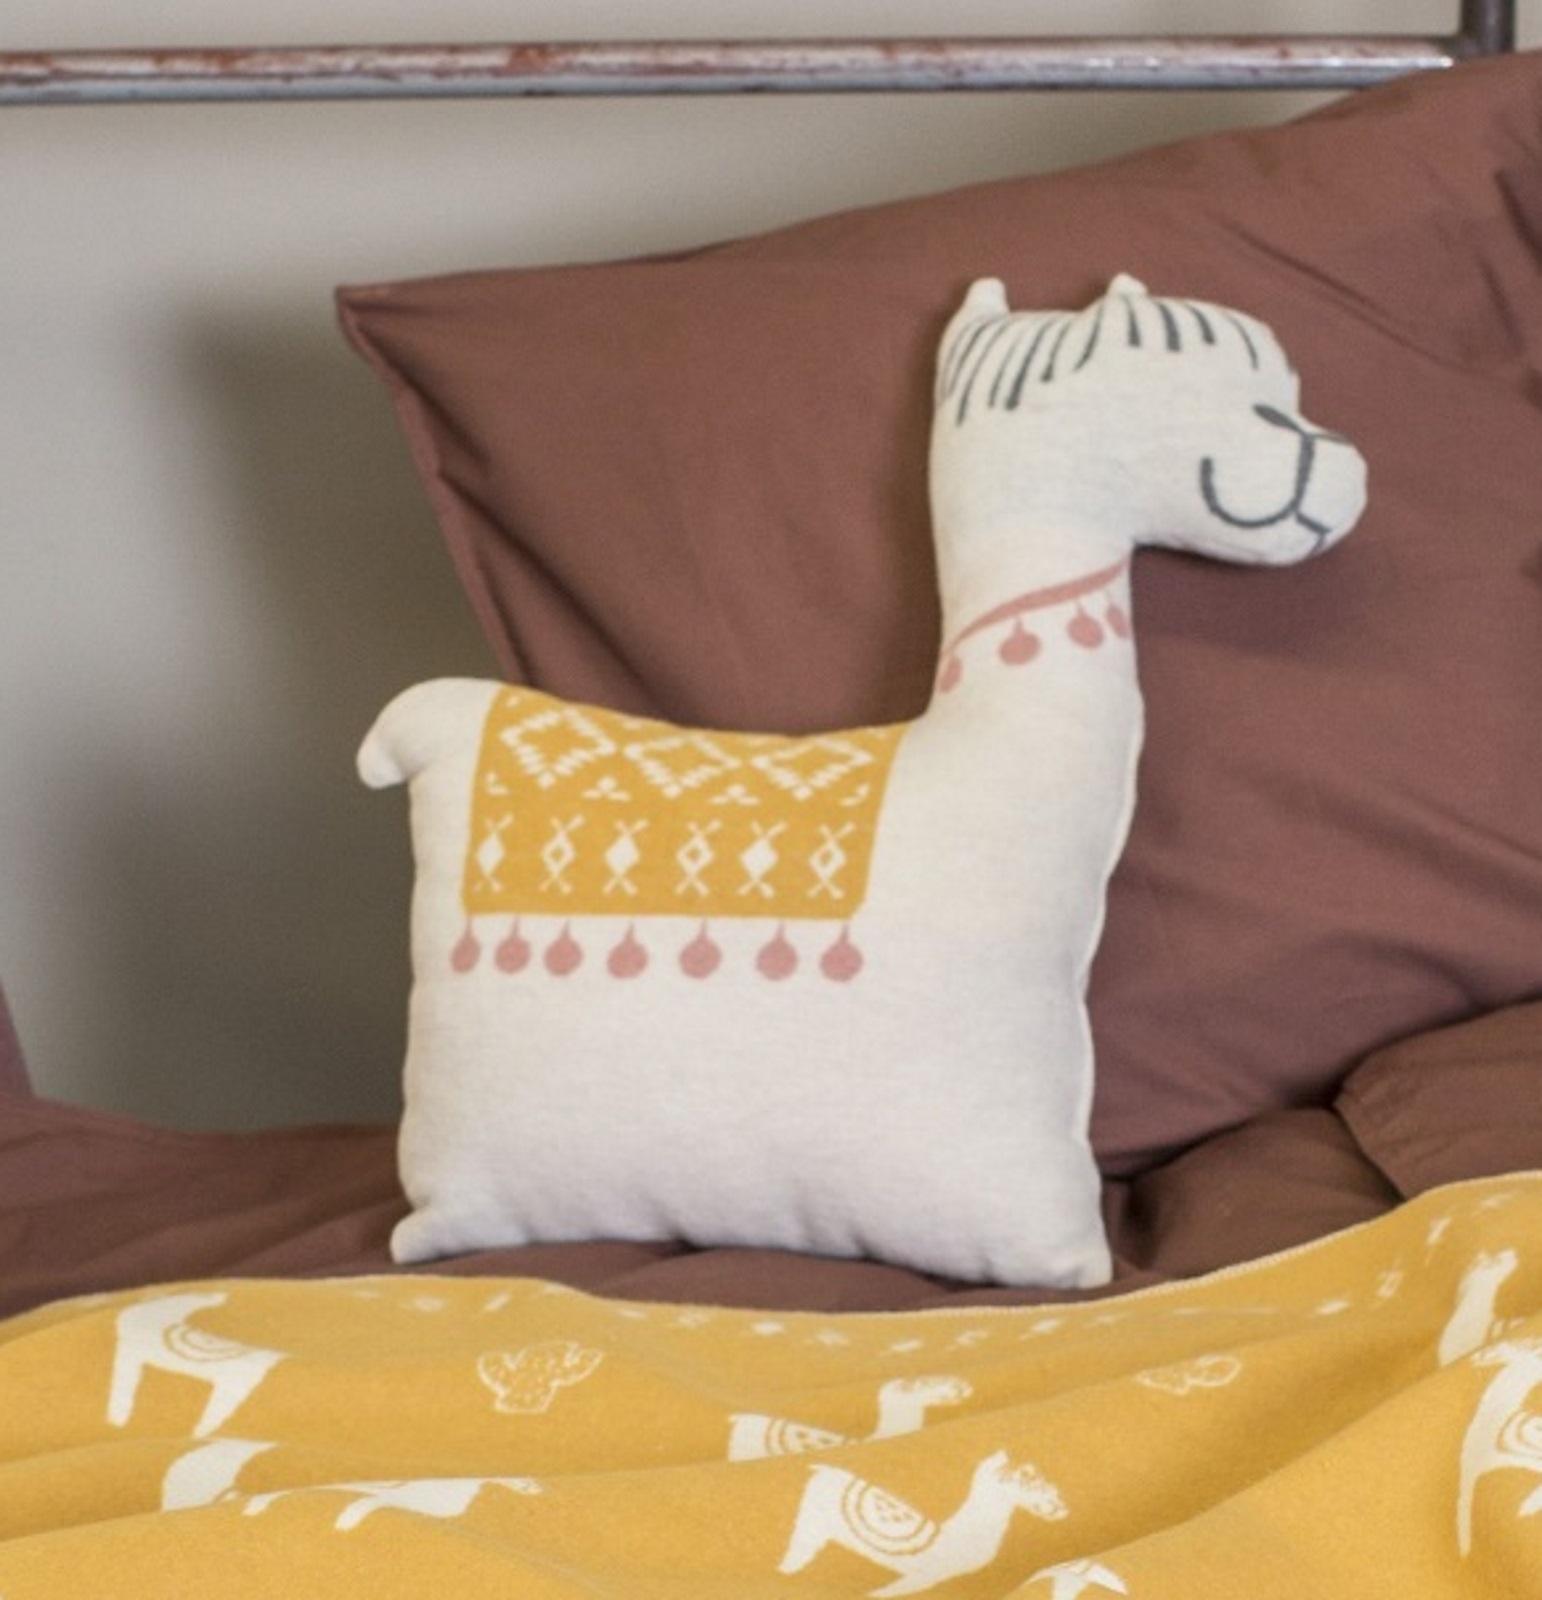 kissen lama rohwei david fussenegger schmusekissen deko zierkissen kissen zierkissen. Black Bedroom Furniture Sets. Home Design Ideas